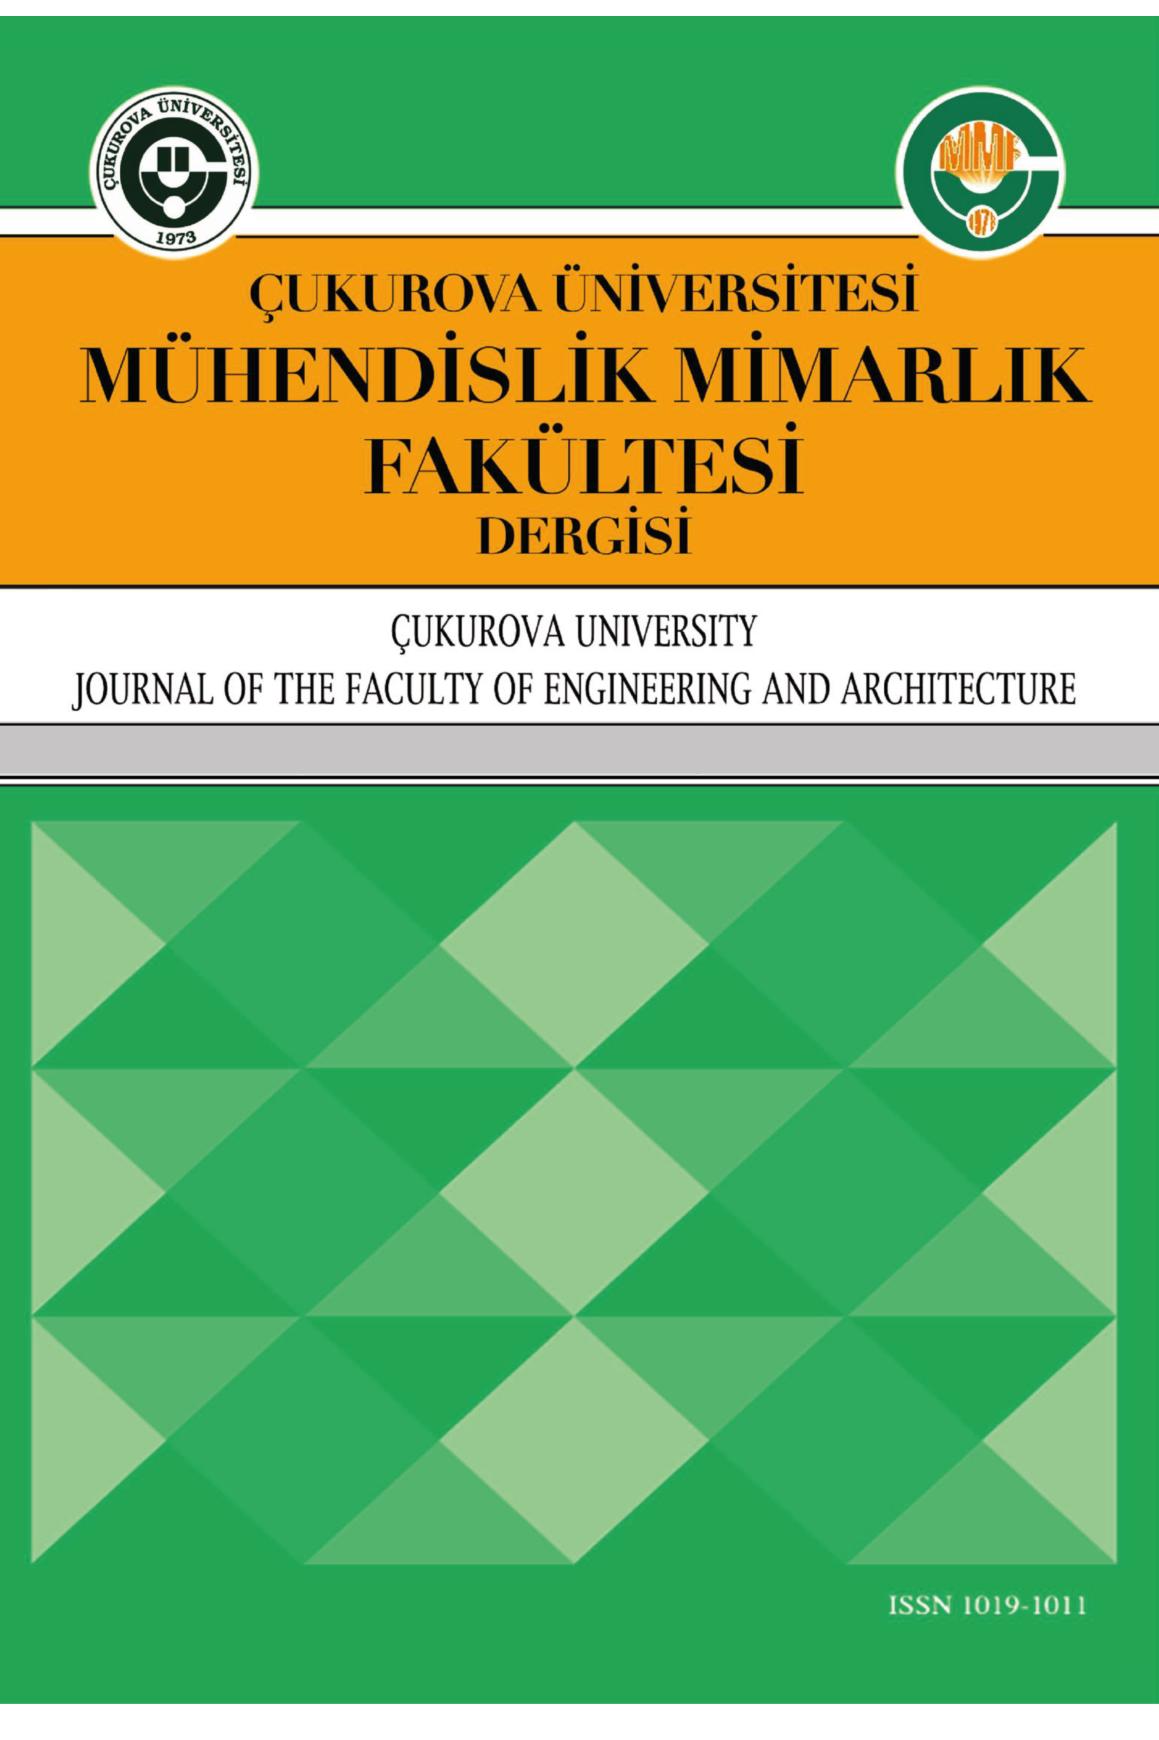 Çukurova Üniversitesi Mühendislik-Mimarlık Fakültesi Dergisi